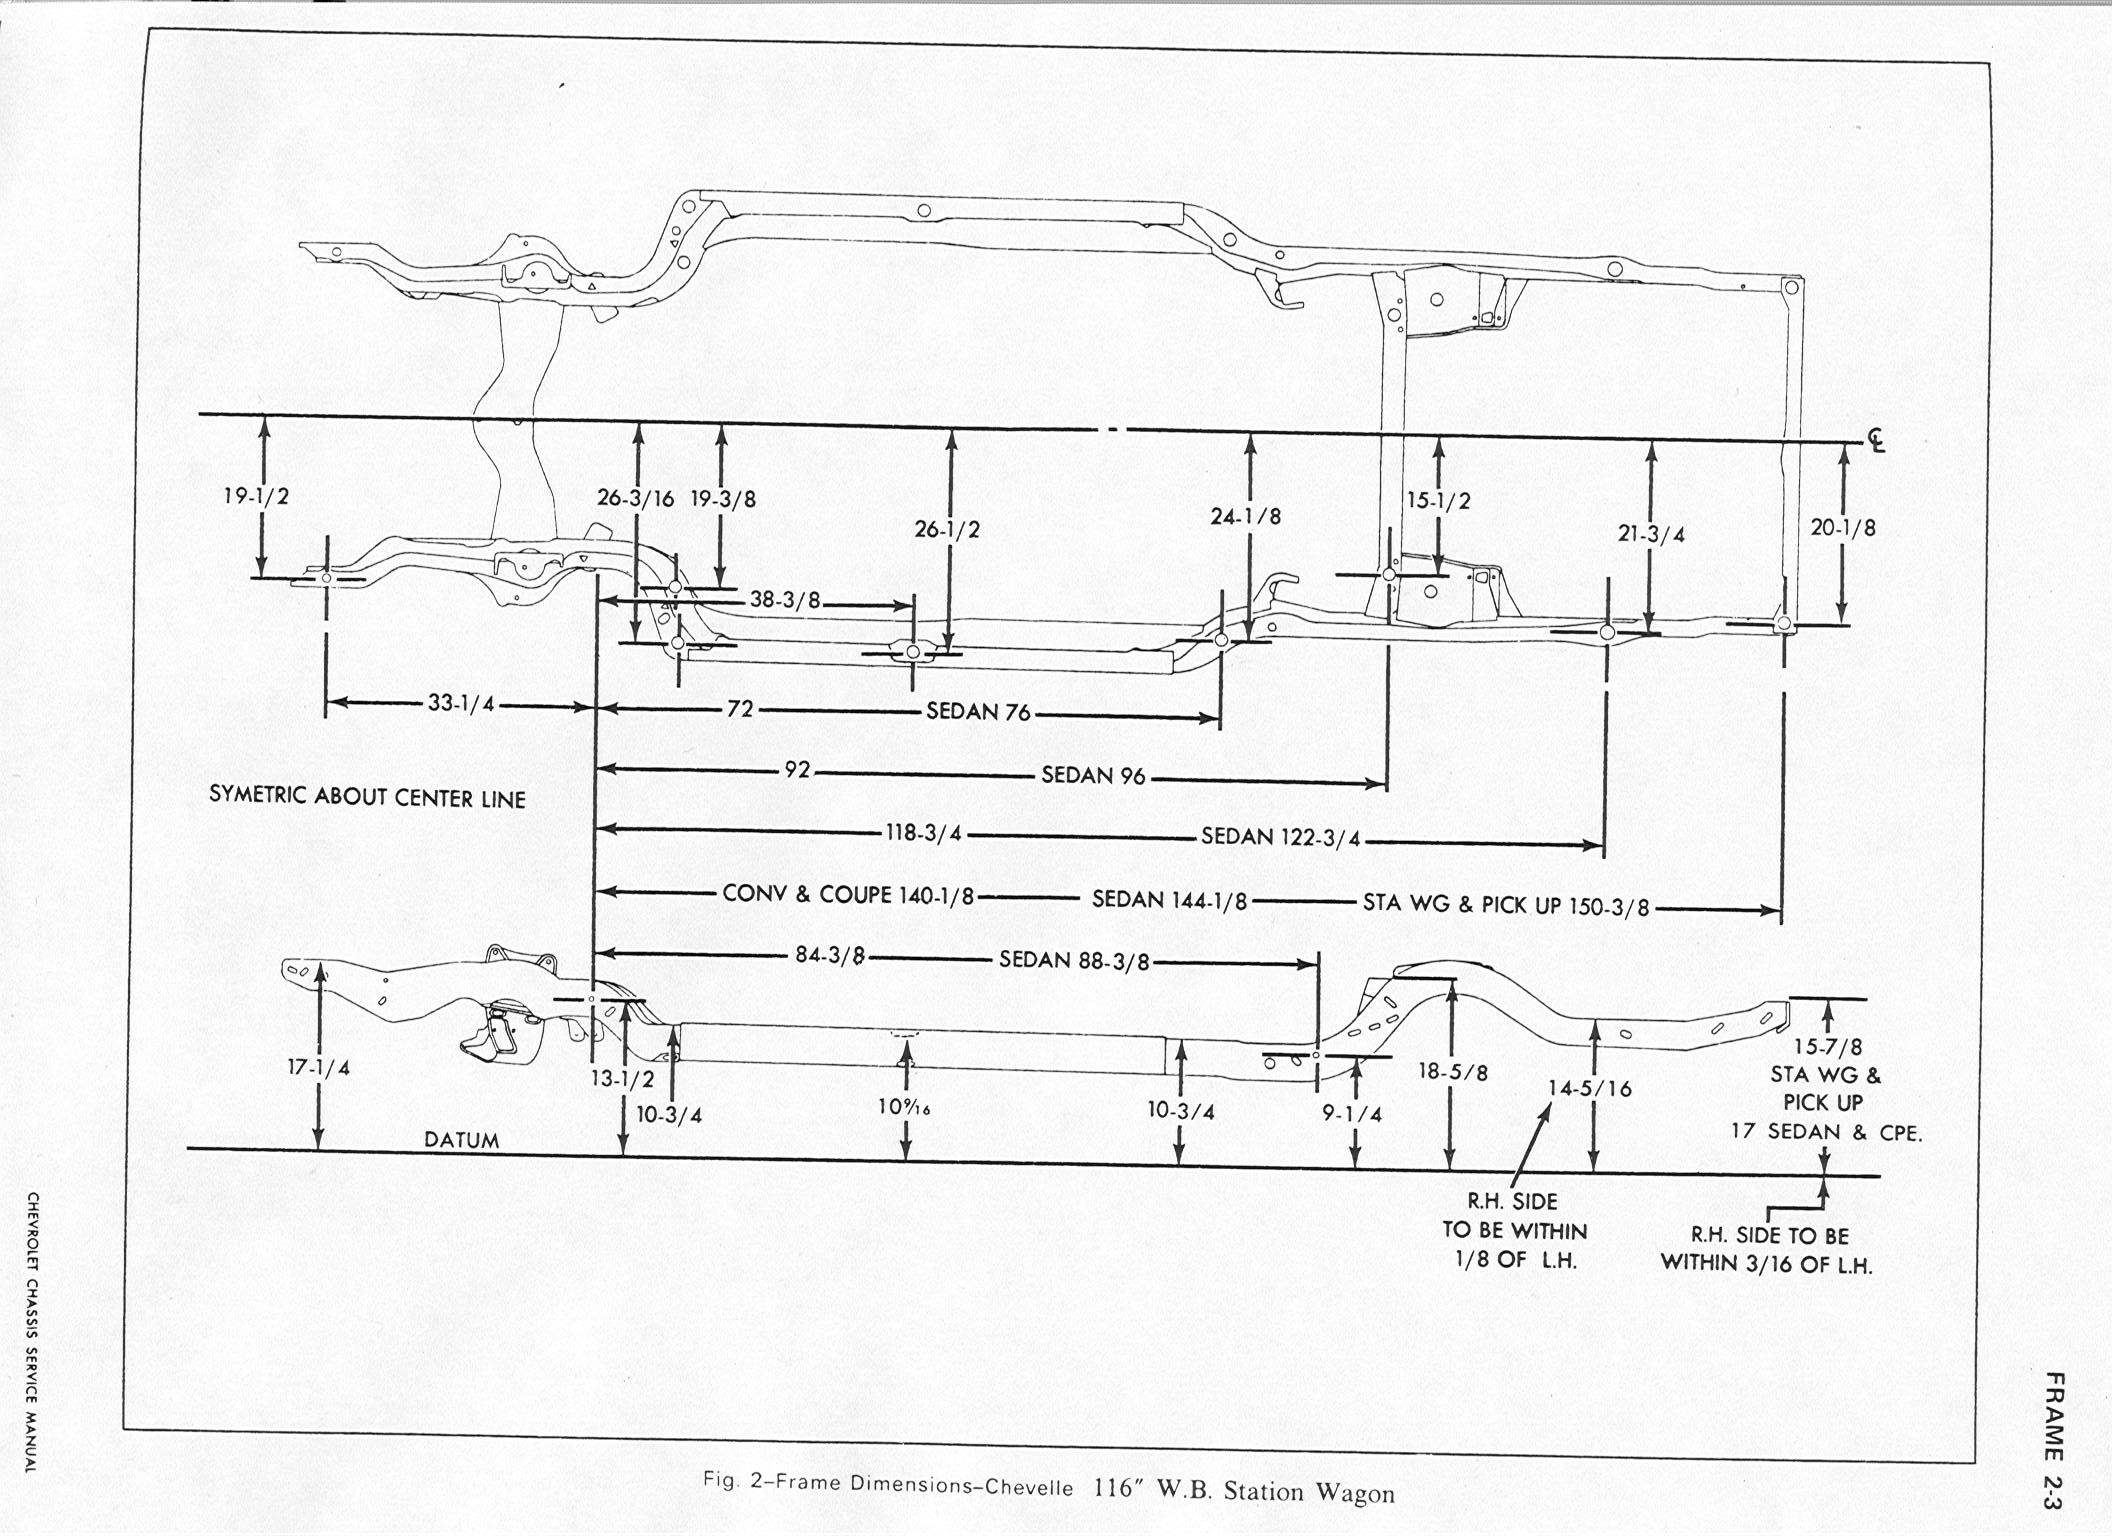 C5 Corvette Seat Wiring Diagram 1970 Chevelle Frame Measurements Chevelle Tech